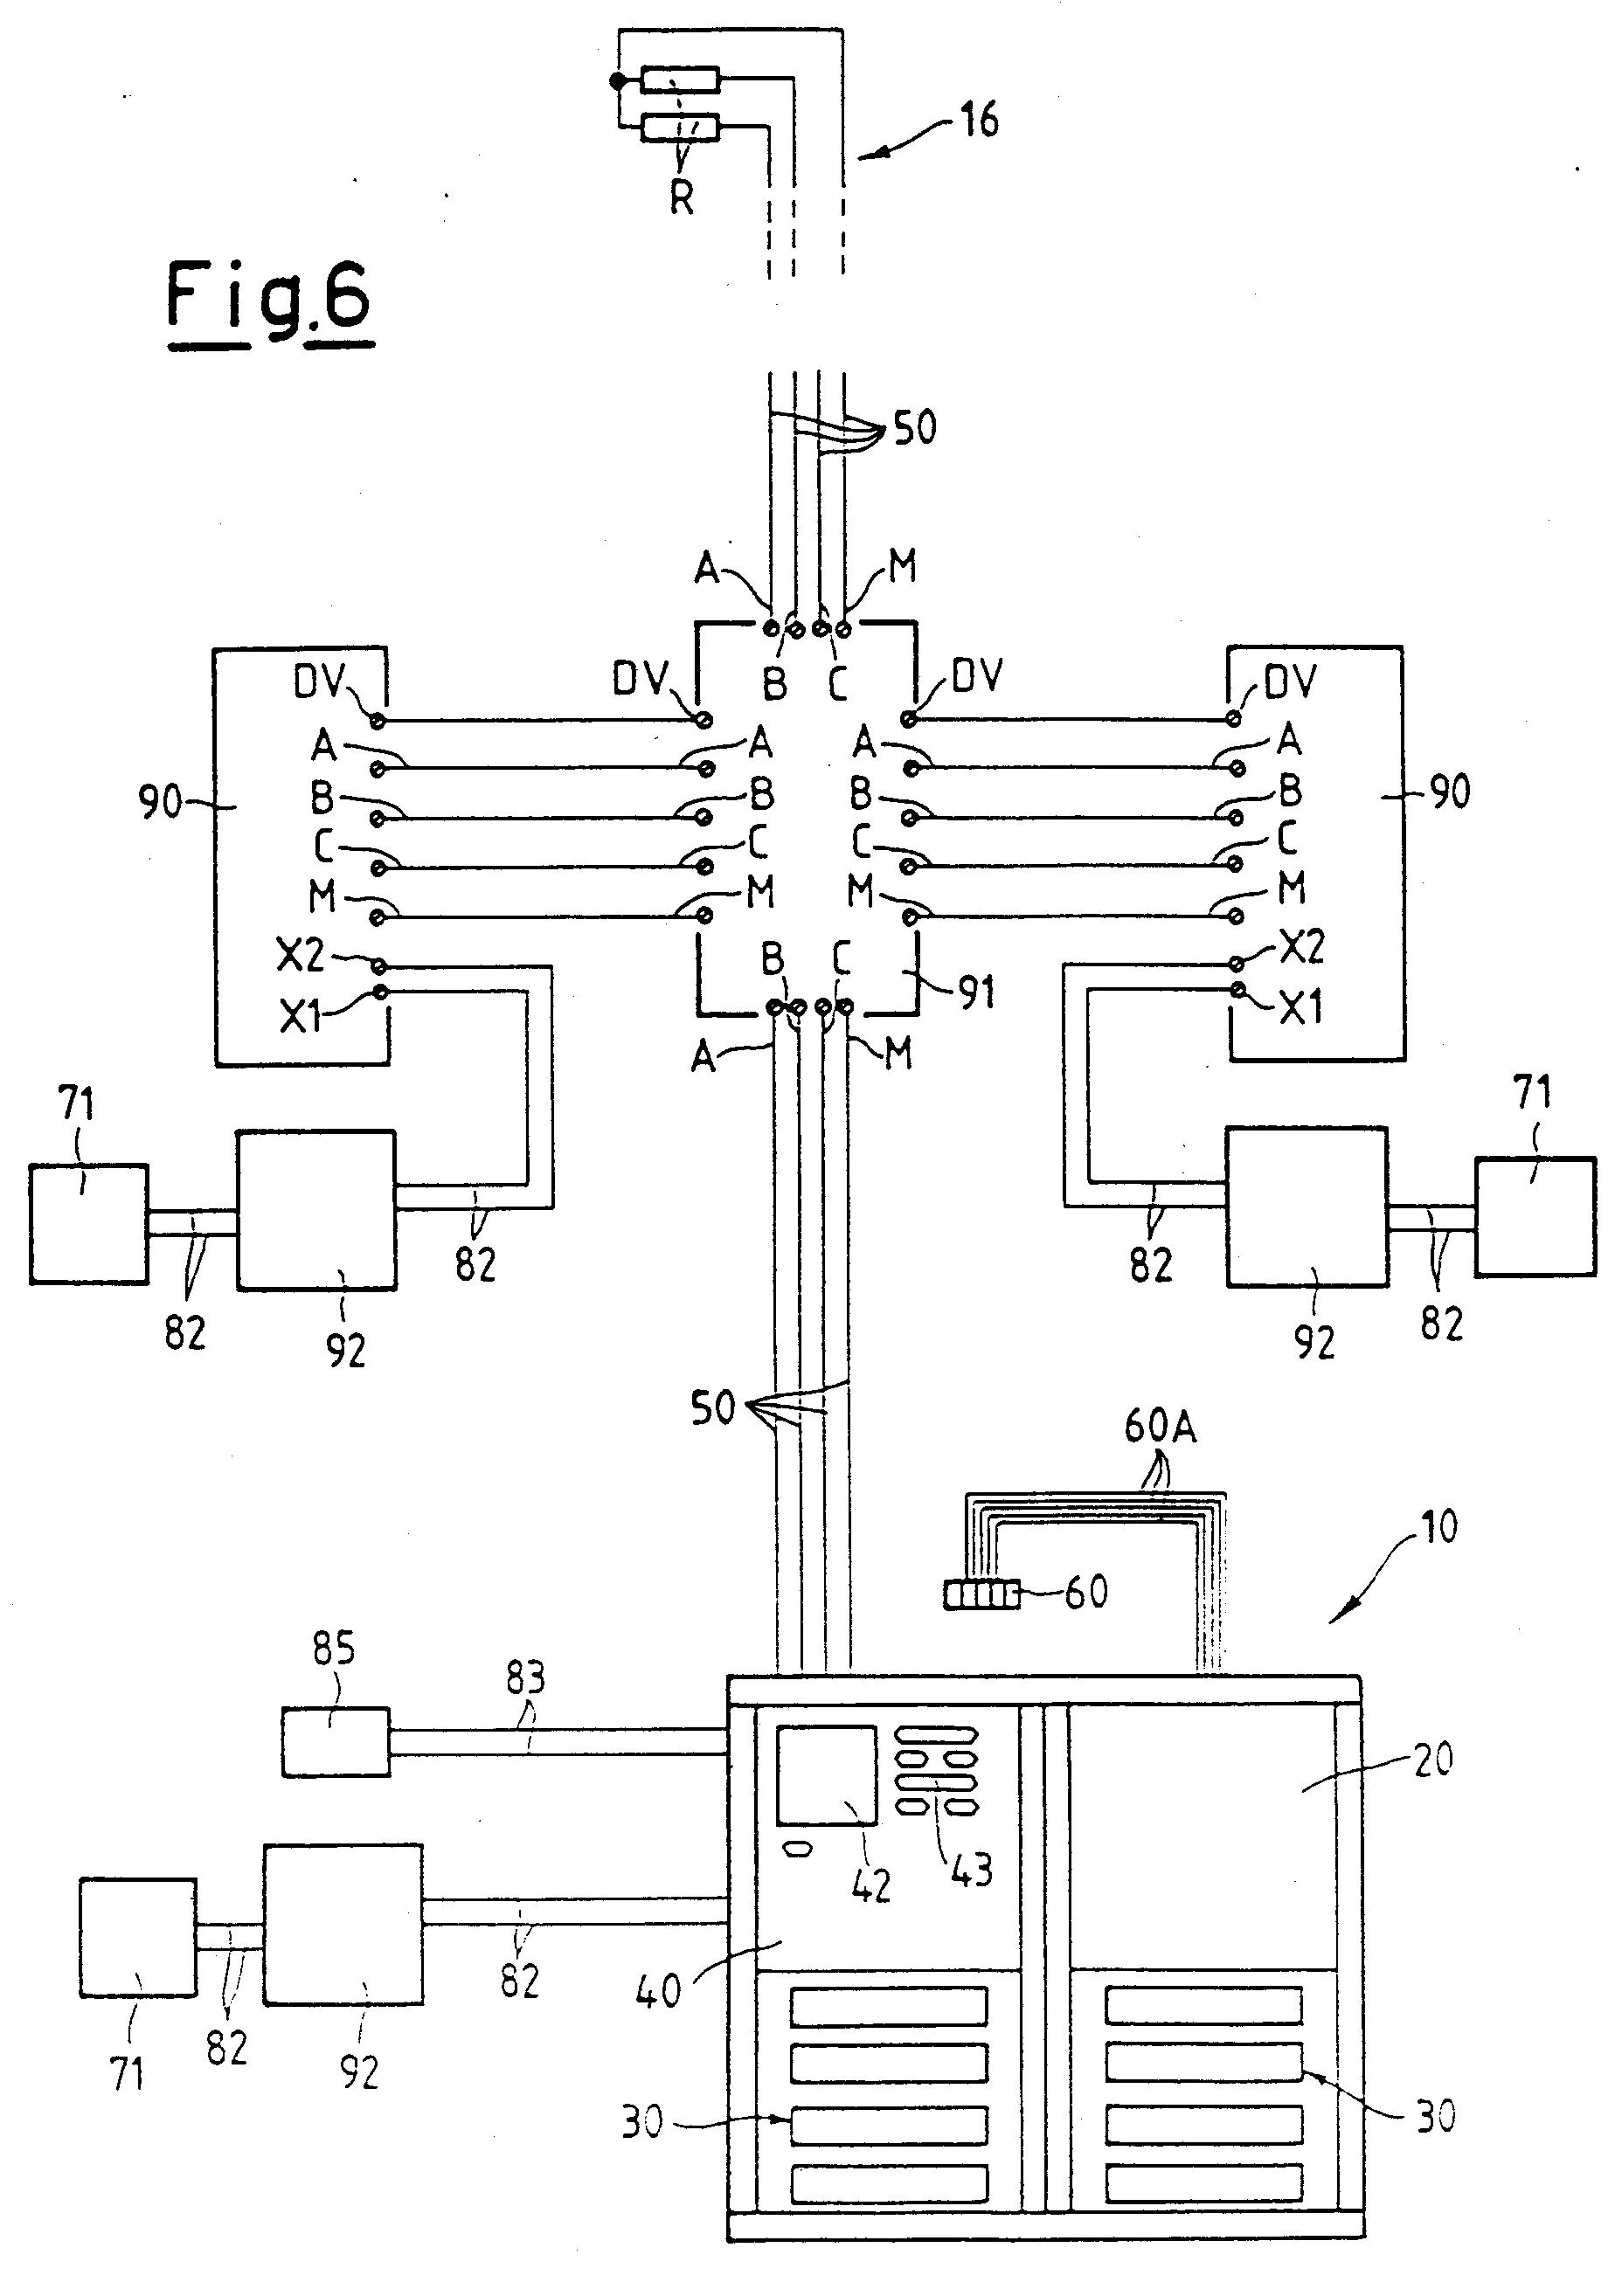 intercom wiring diagram 3 circle venn graphic organizer comelit 22 images